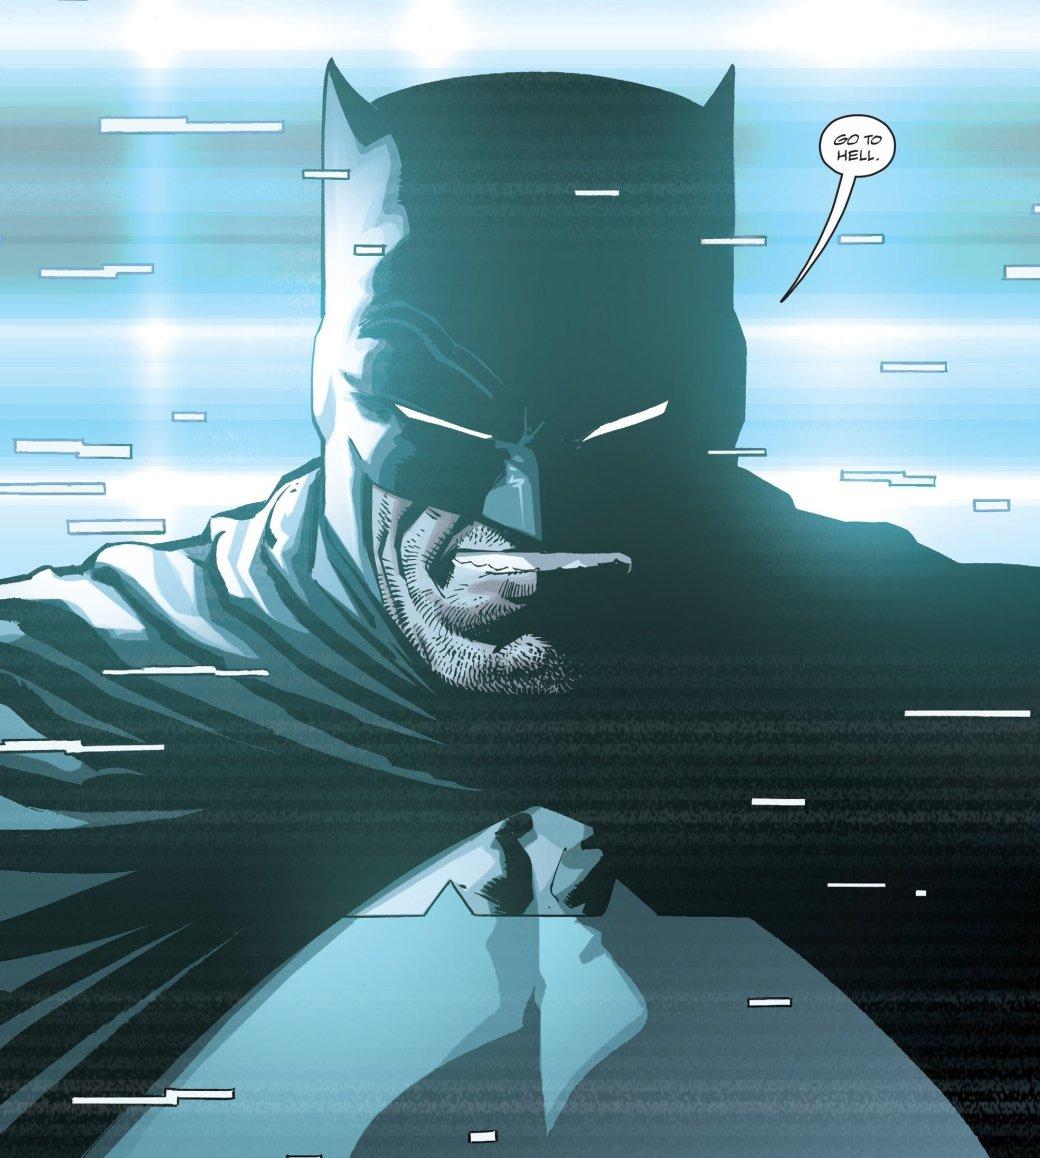 The Dark Knight: что нетак скомиксами Фрэнка Миллера про Бэтмена? | Канобу - Изображение 19